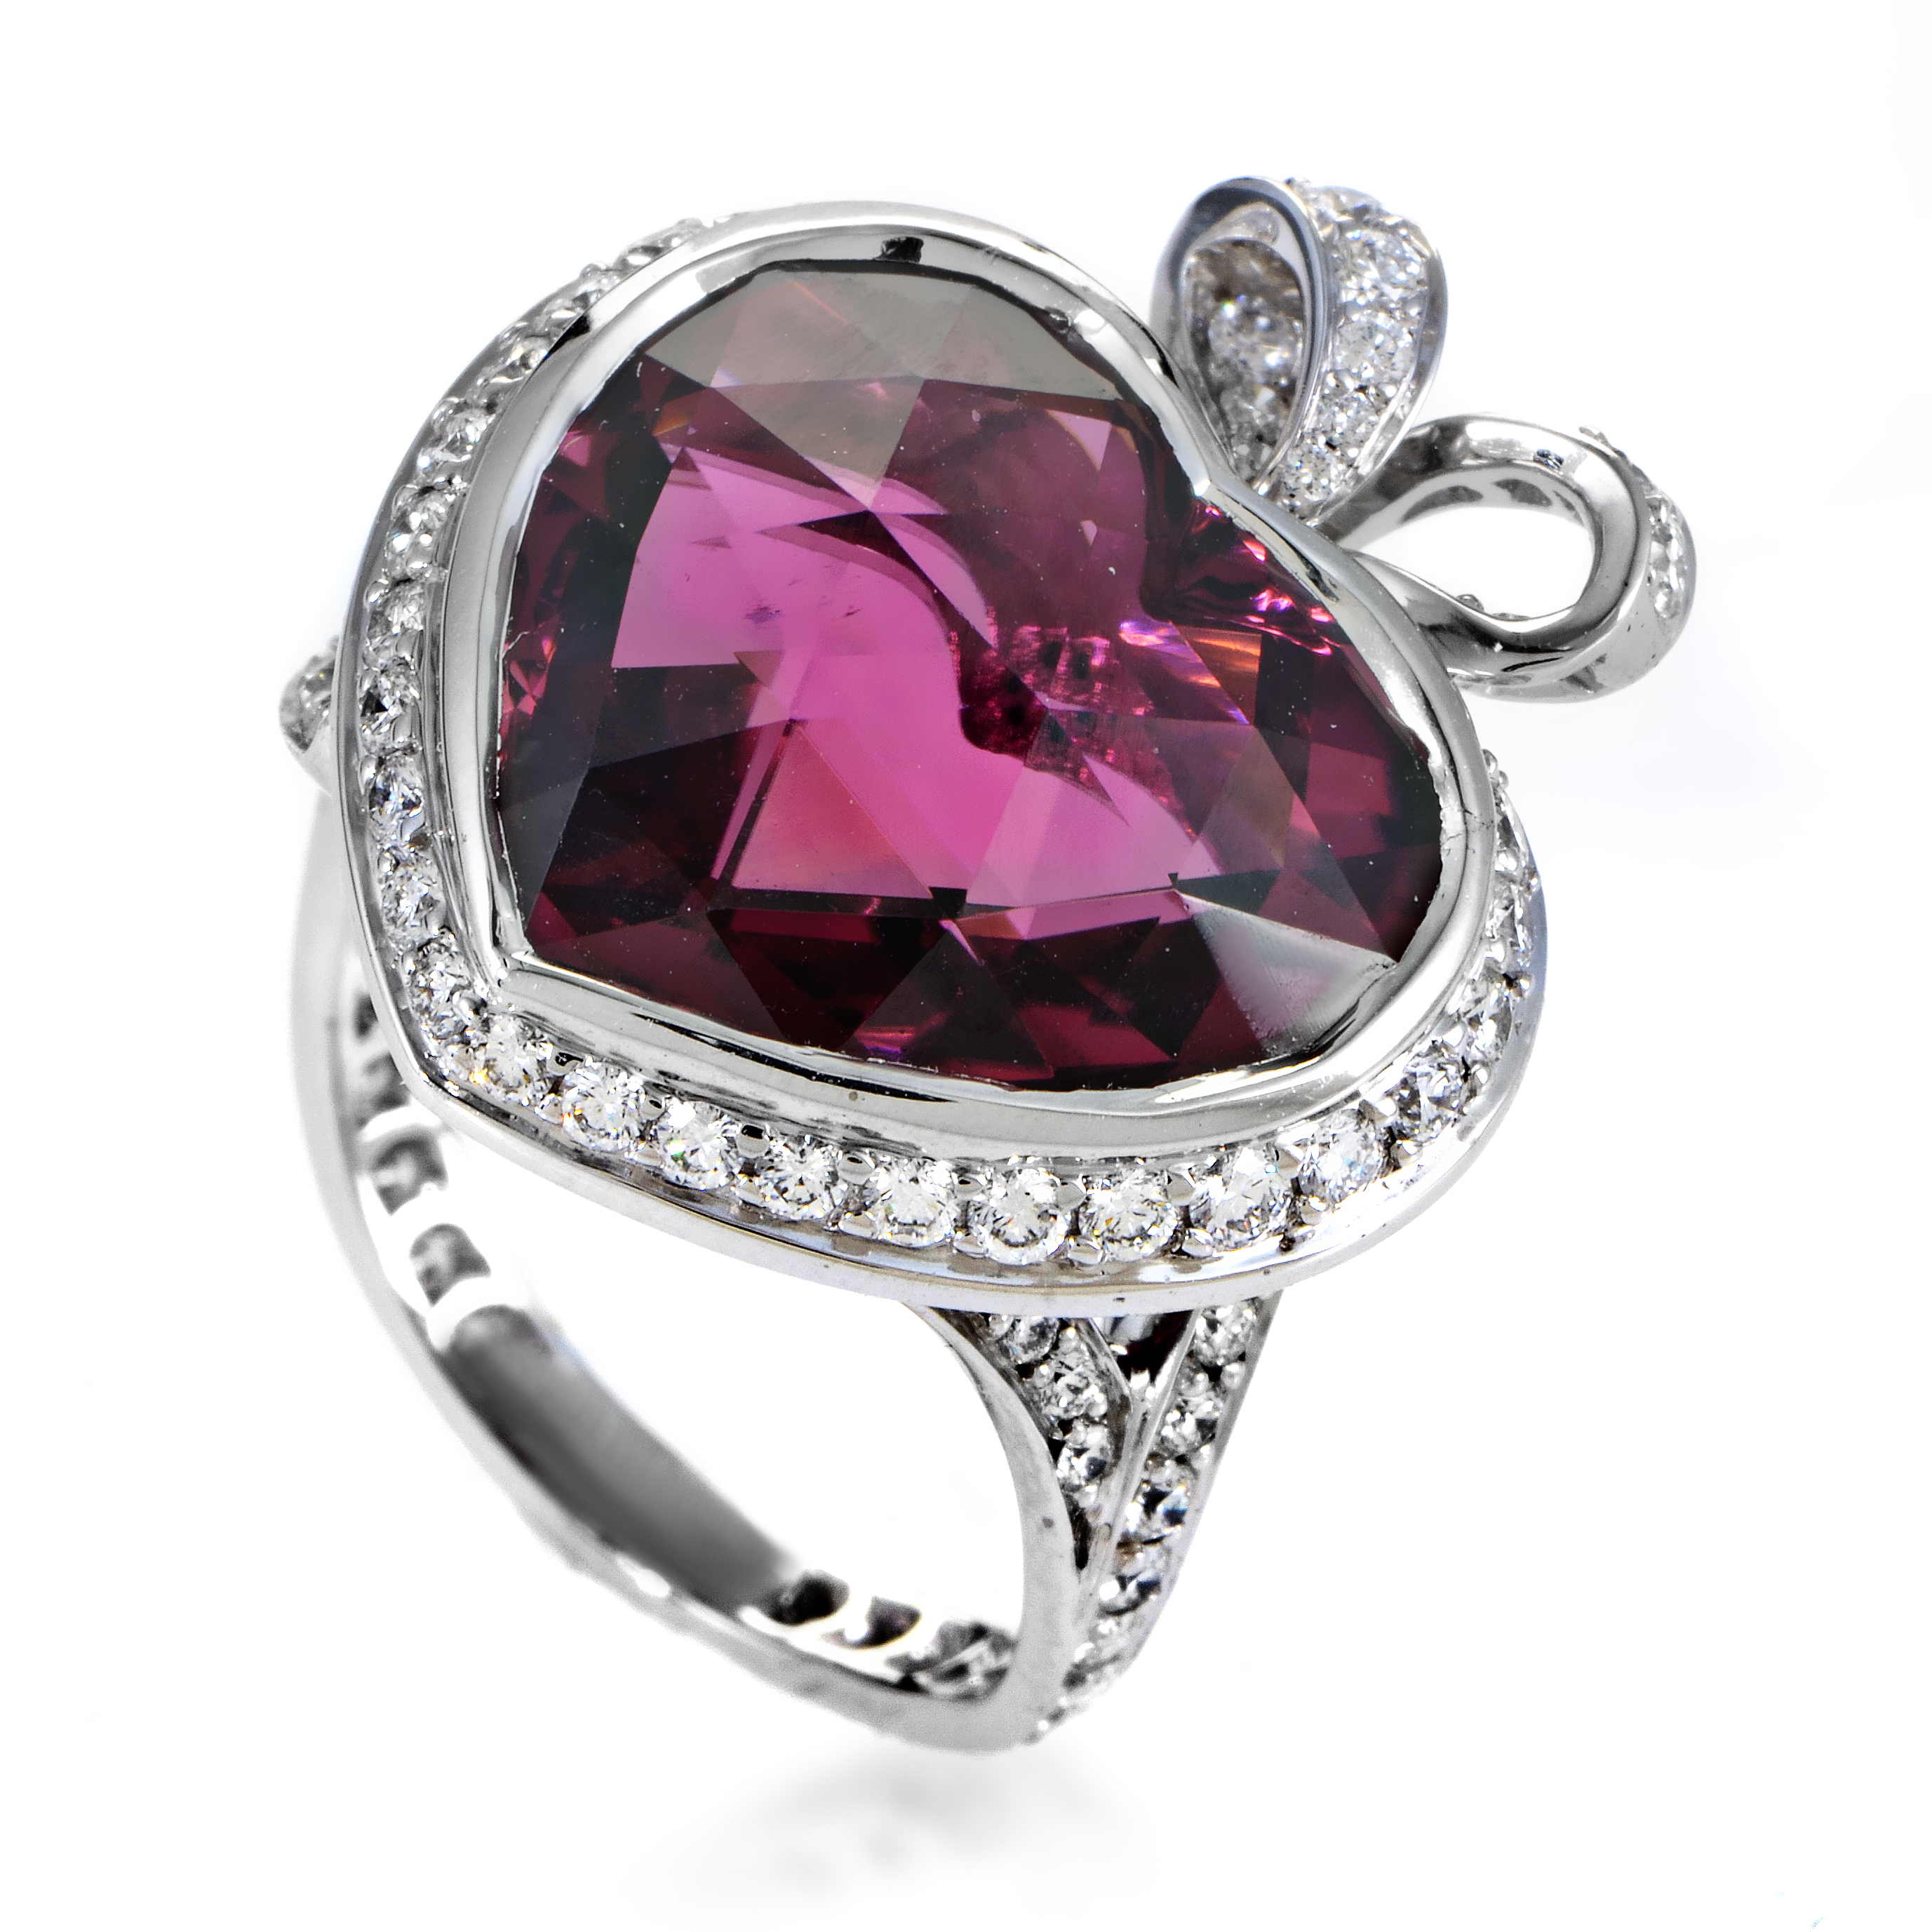 Coeur Romantique Women's 18K White Gold Diamond & Pink Tourmaline Ring